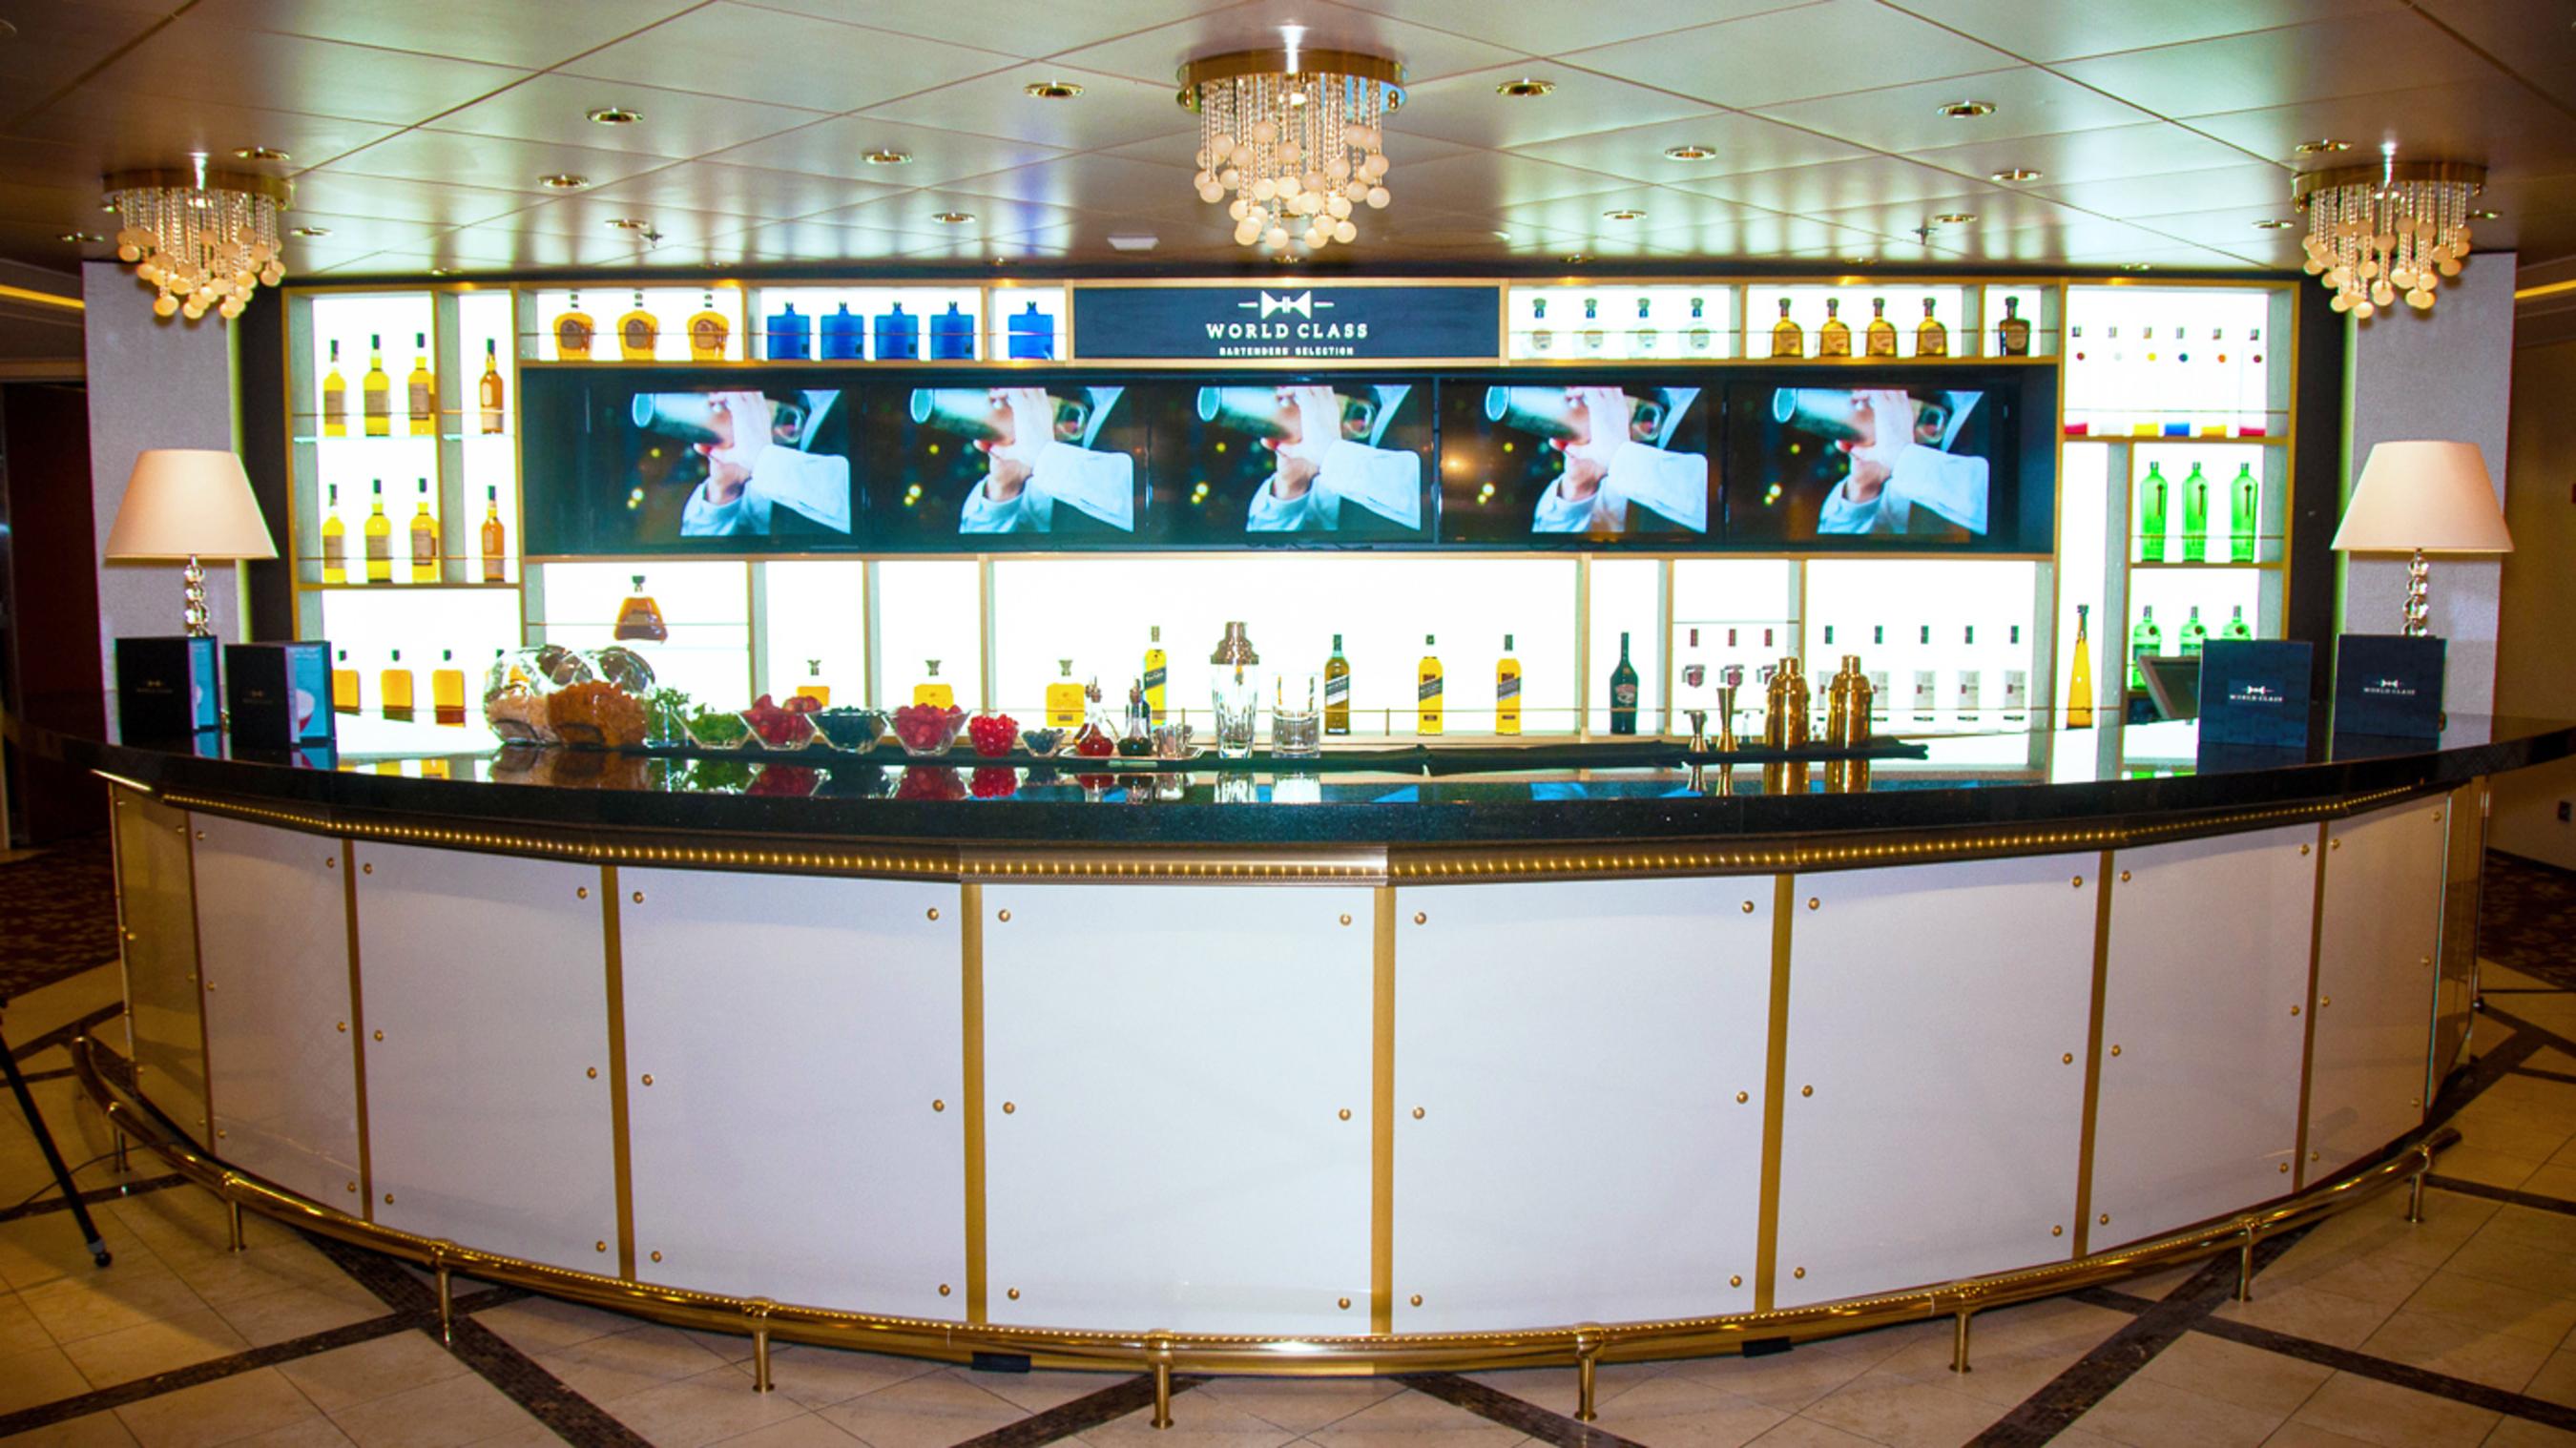 Celebrity Cruises' World Class Bar onboard the award-winning Celebrity Eclipse